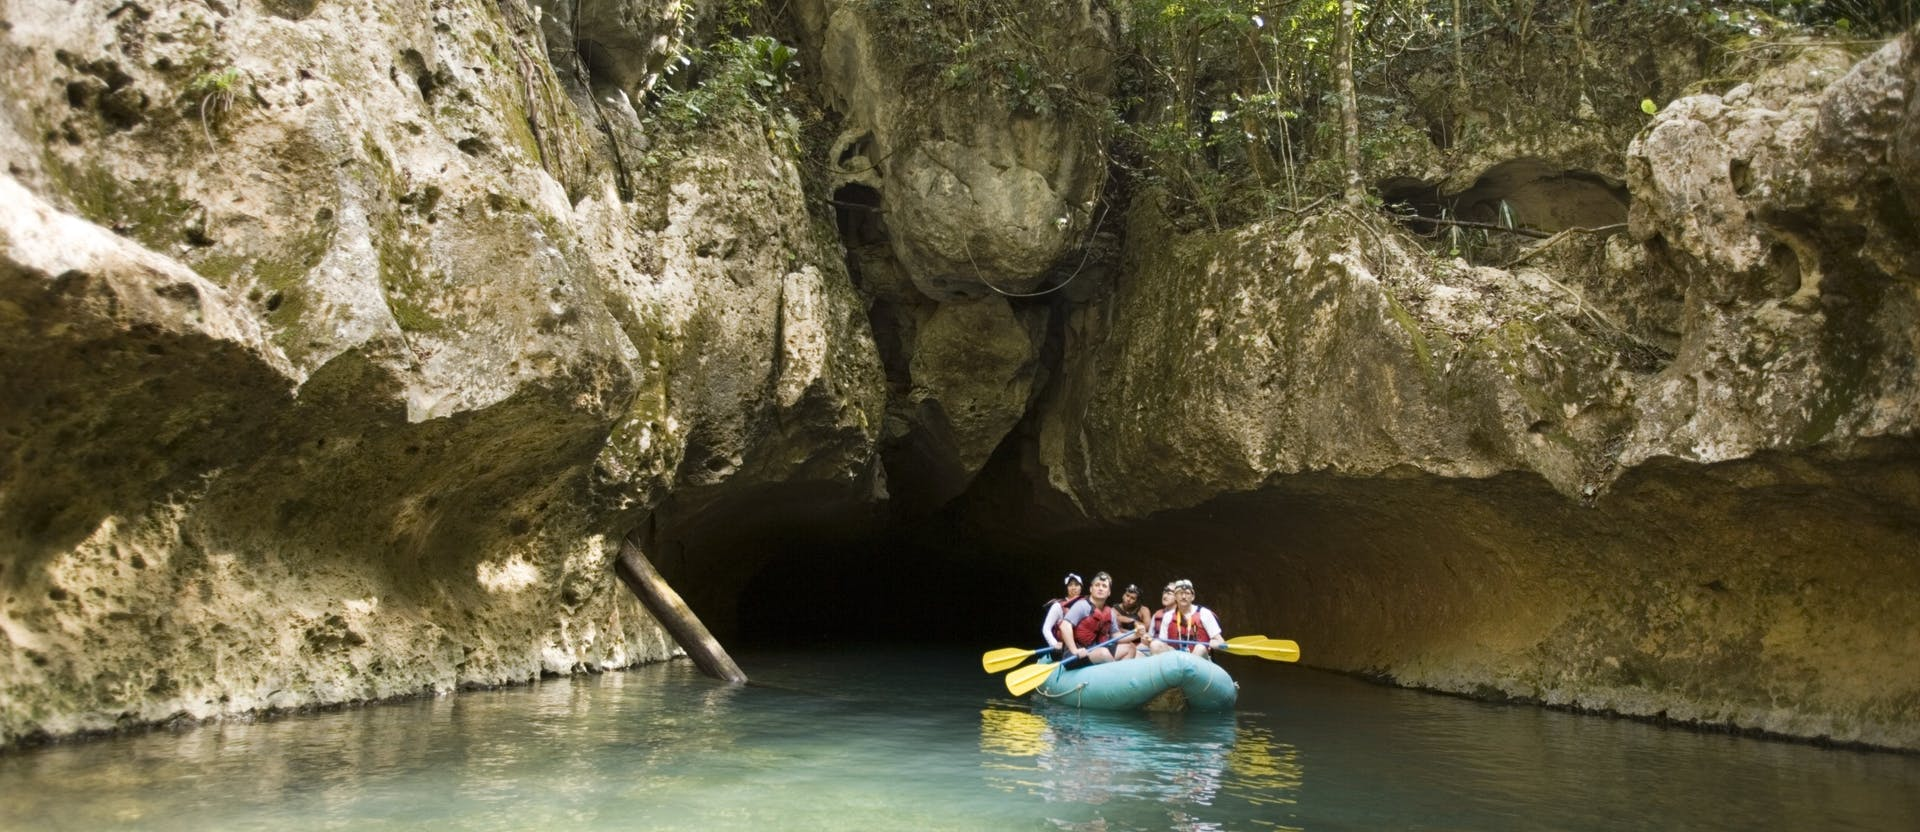 nohoch che'en cave tubing kayaking belize cave